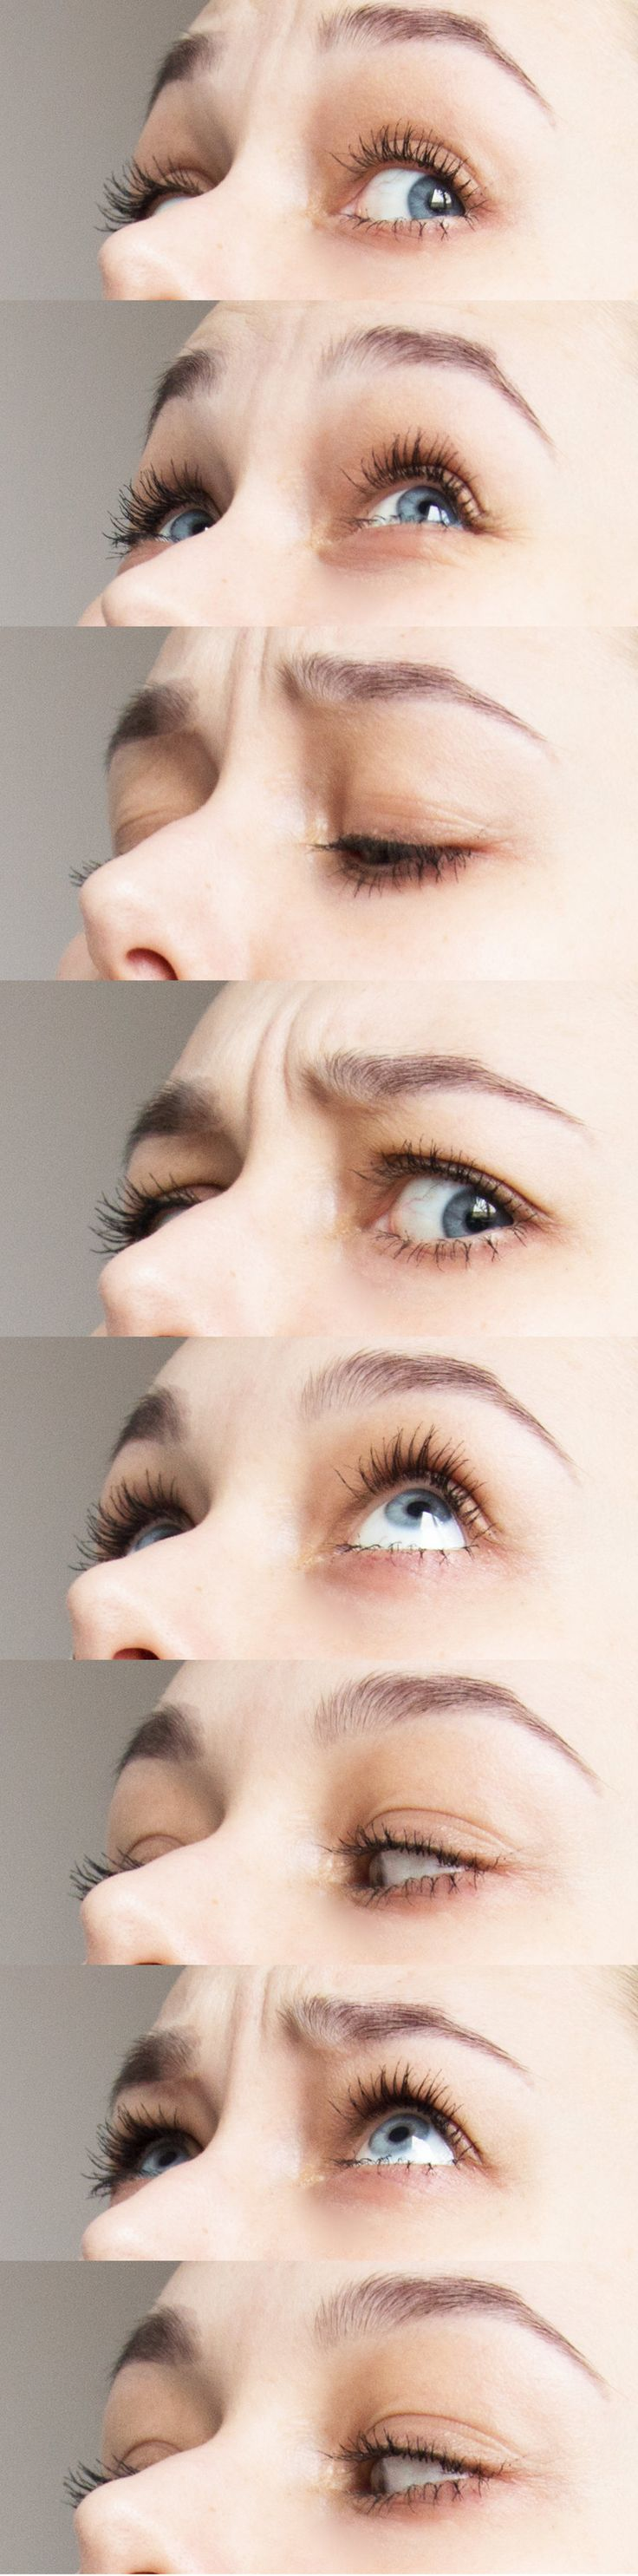 Eyes Ref 3/4 up by Miko-Noire on DeviantArt